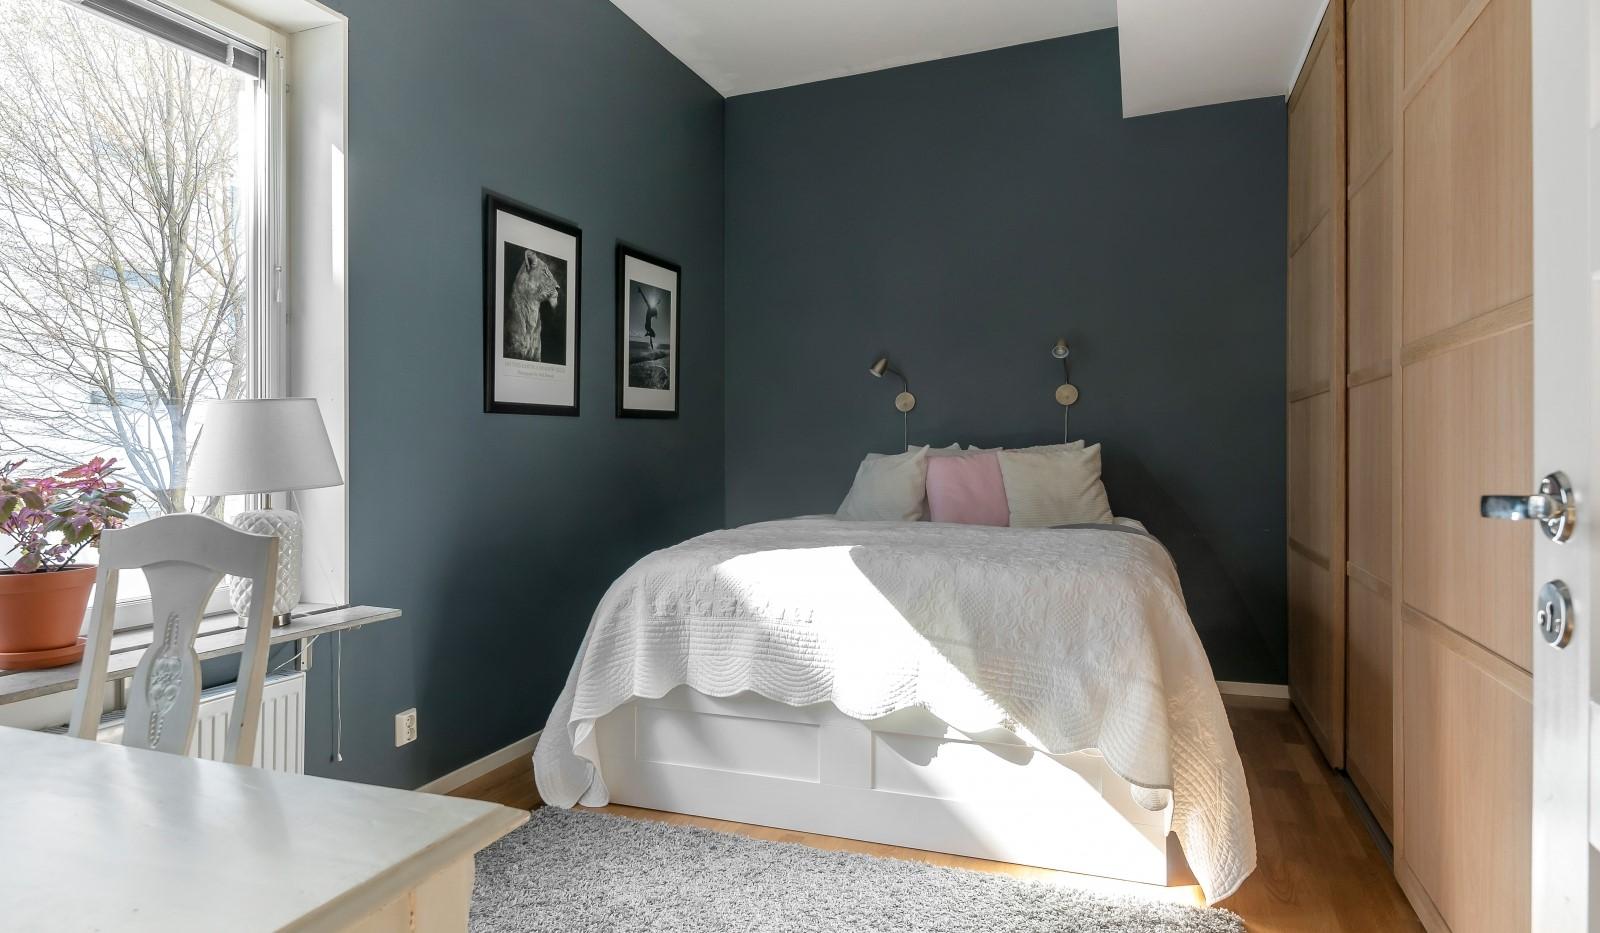 Heliosgatan 58 - Rofyllt sovrum i vacker kulör